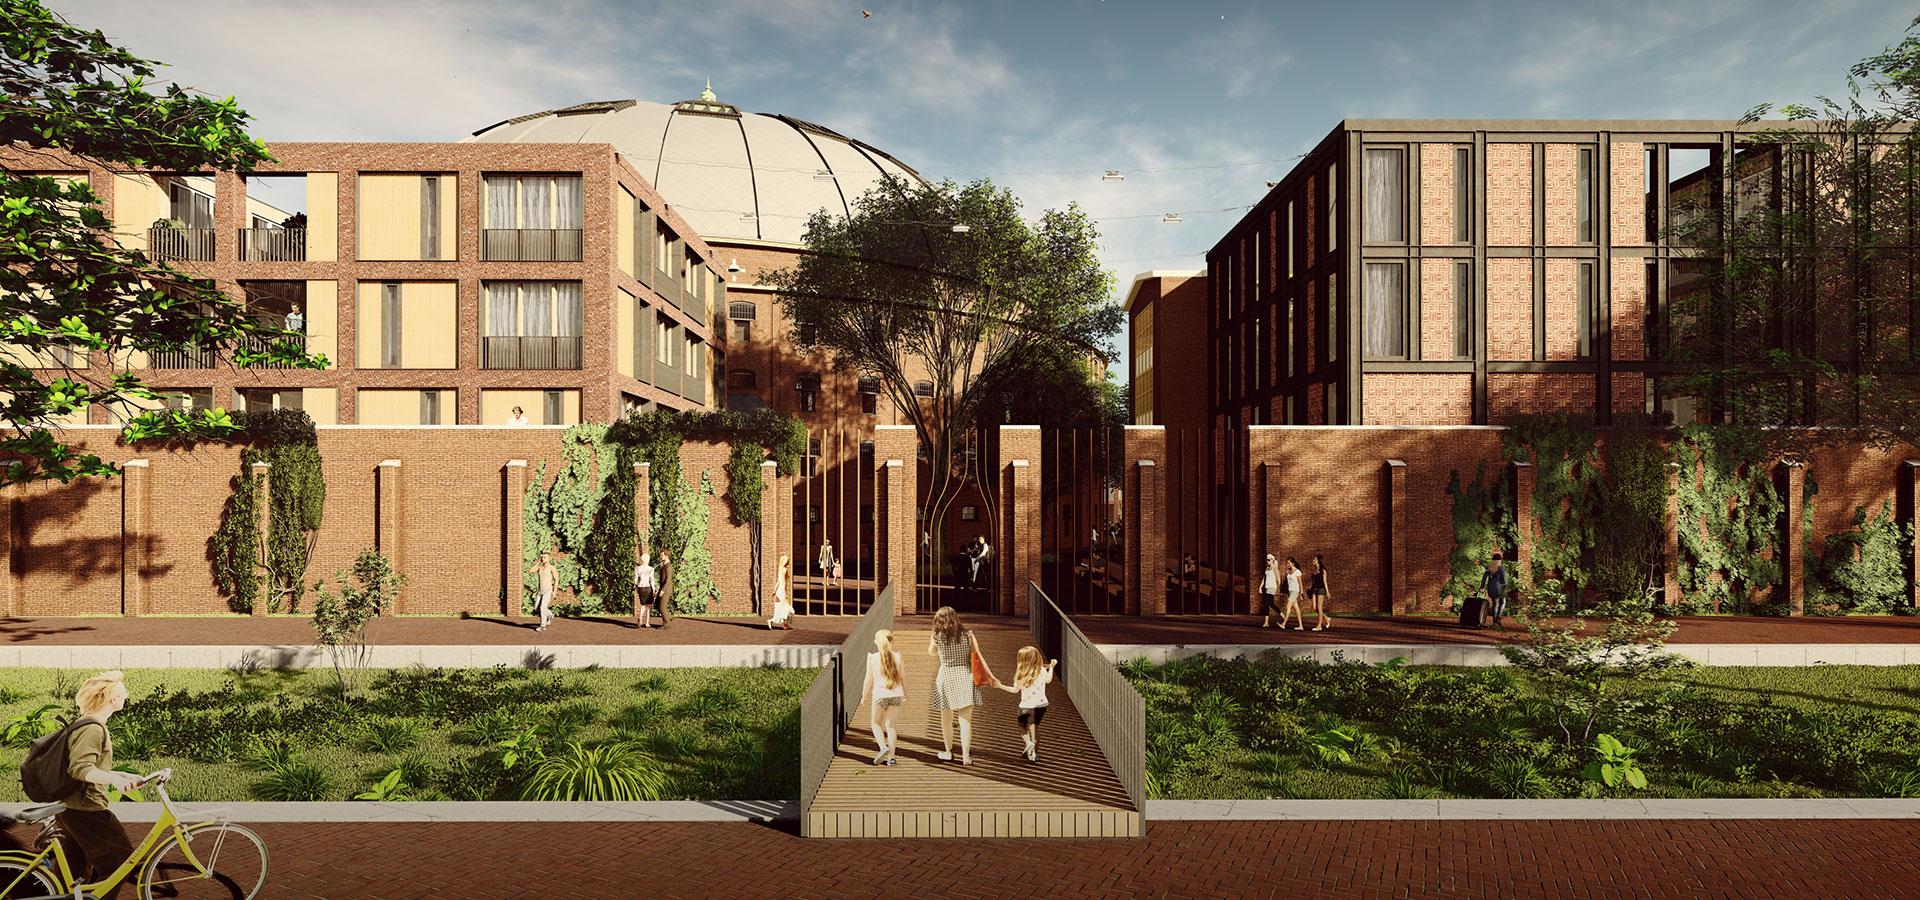 FARO architecten Koepel Haarlem 02